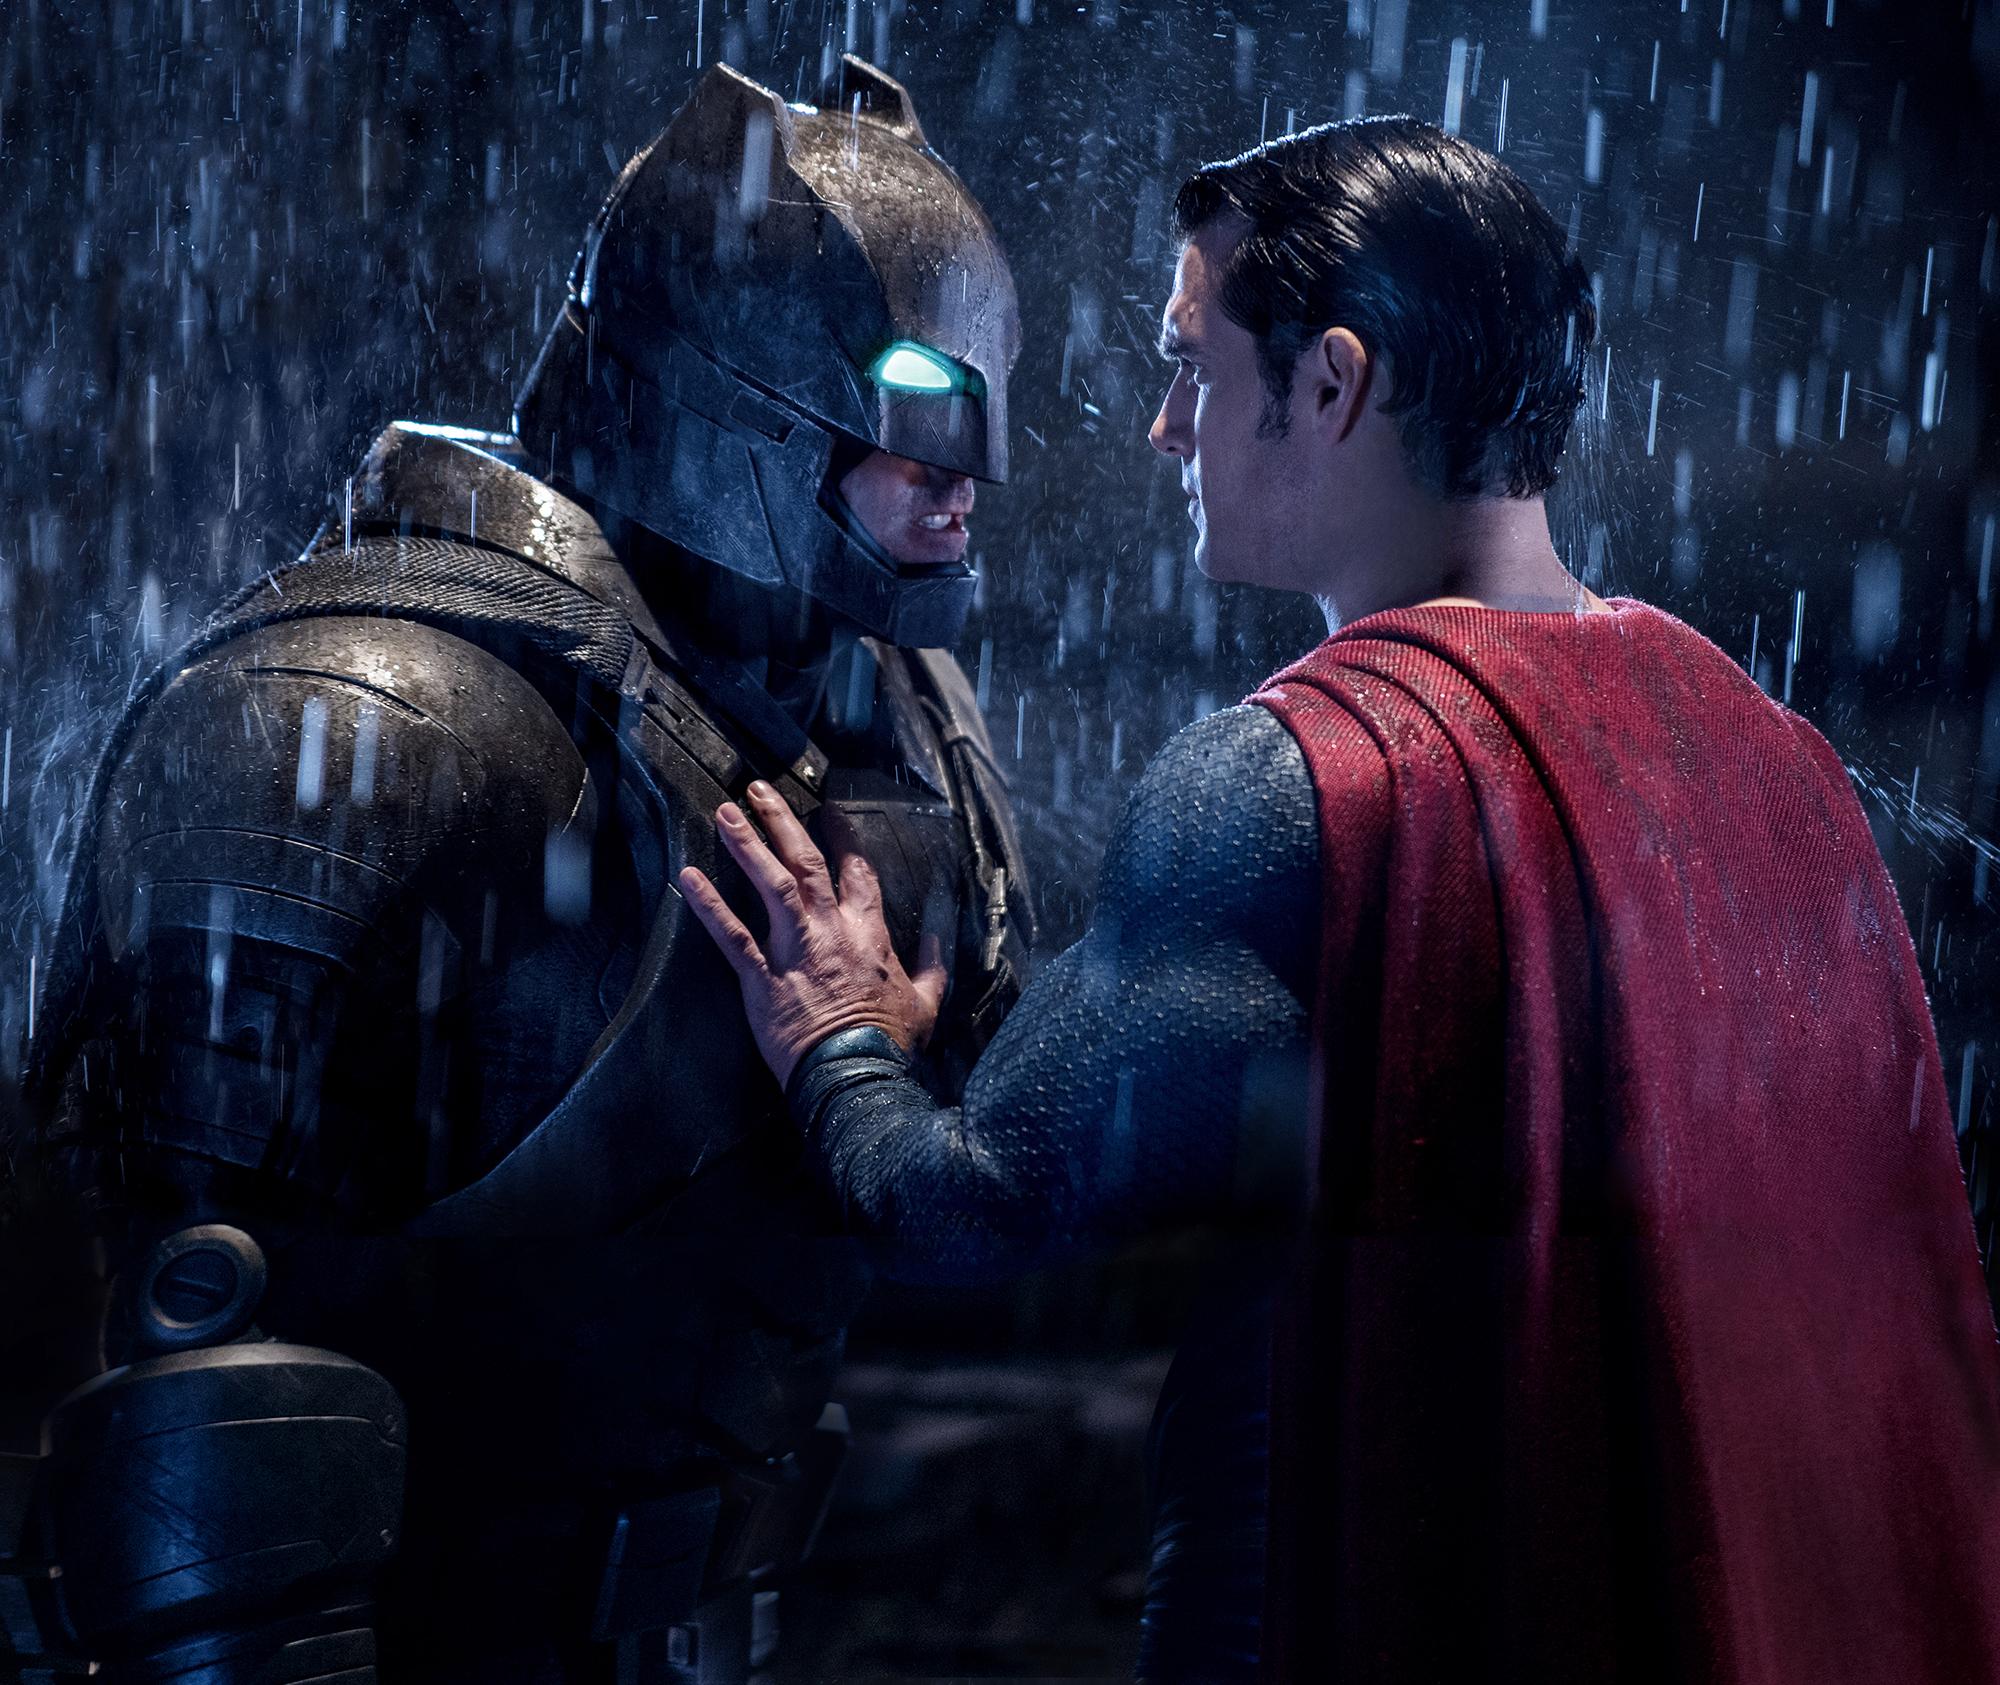 Ben Affleck in Batman v Superman: Dawn of Justice in 2016.